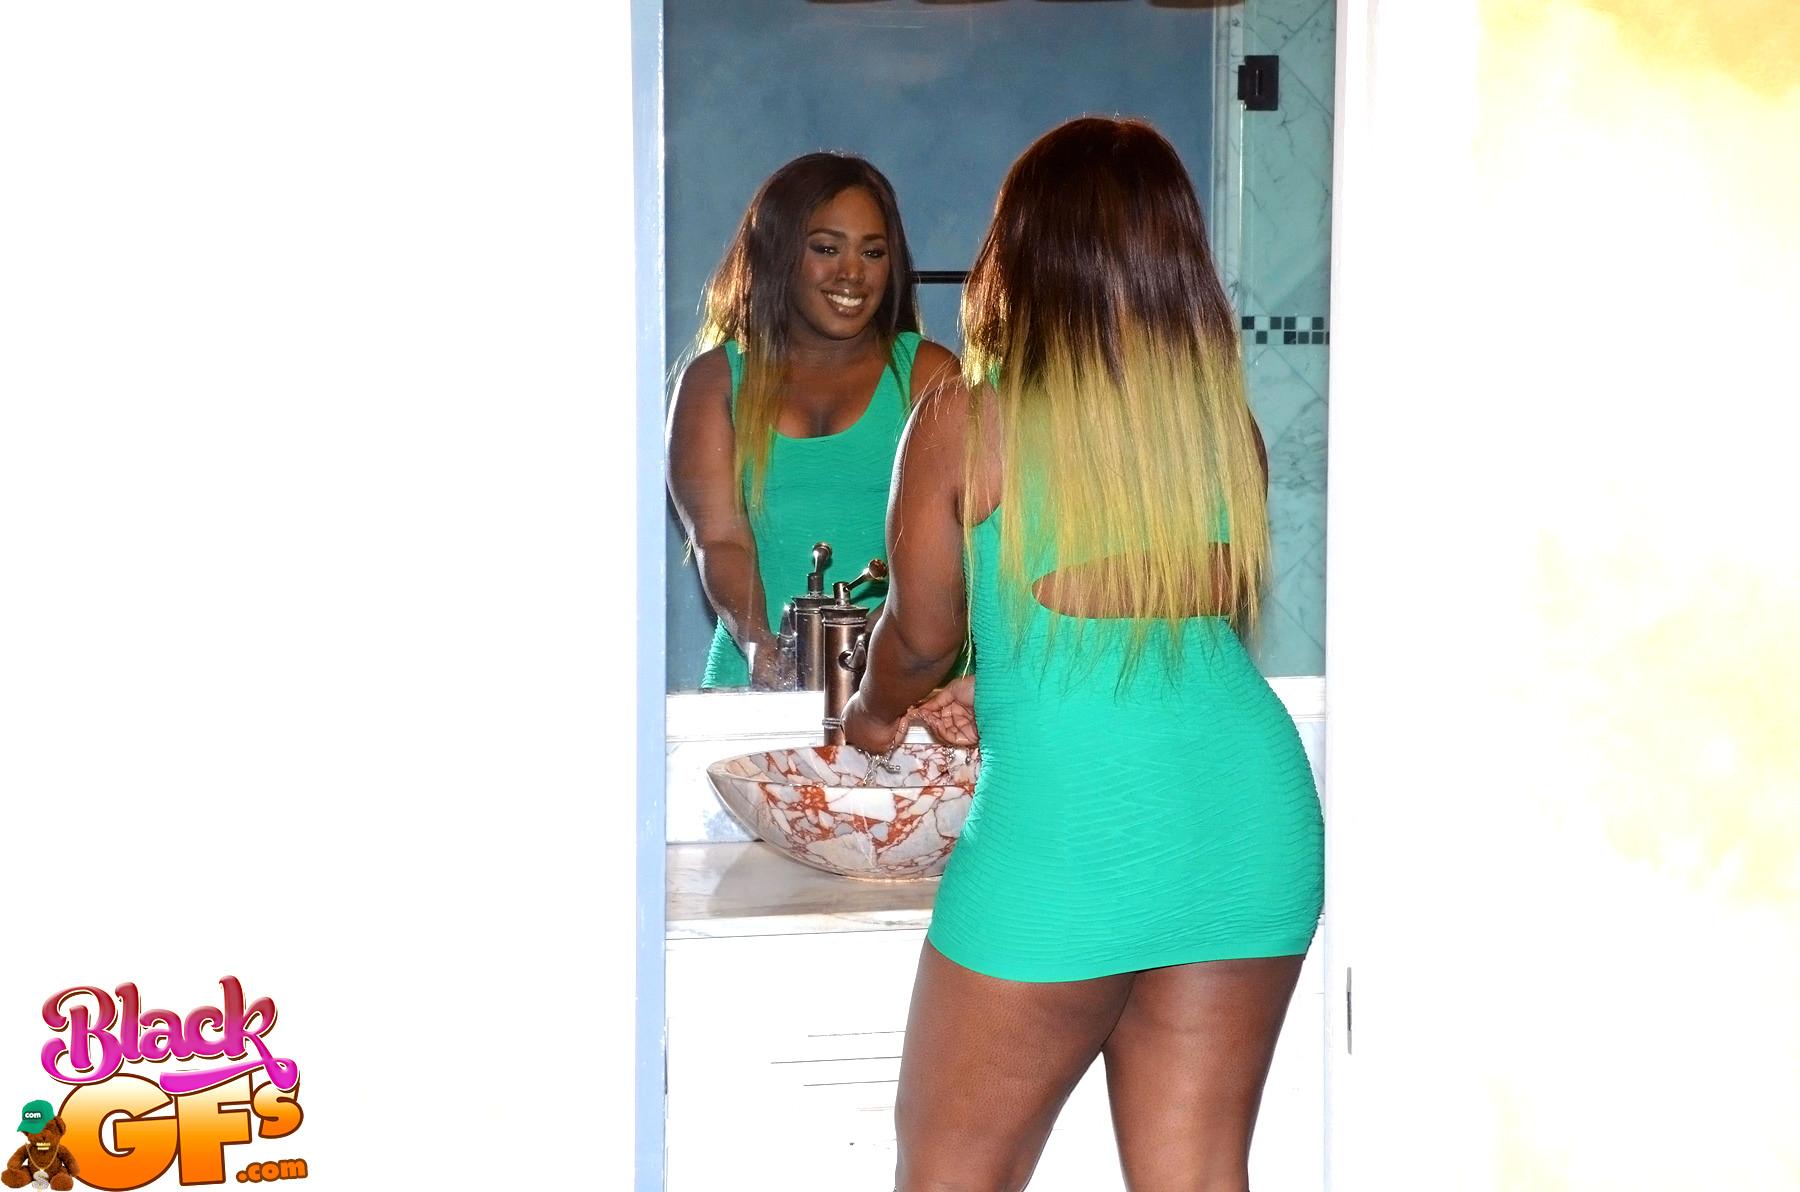 Snap Leaks Miss Mary Jane Hq Black Girl Sex HD Pics